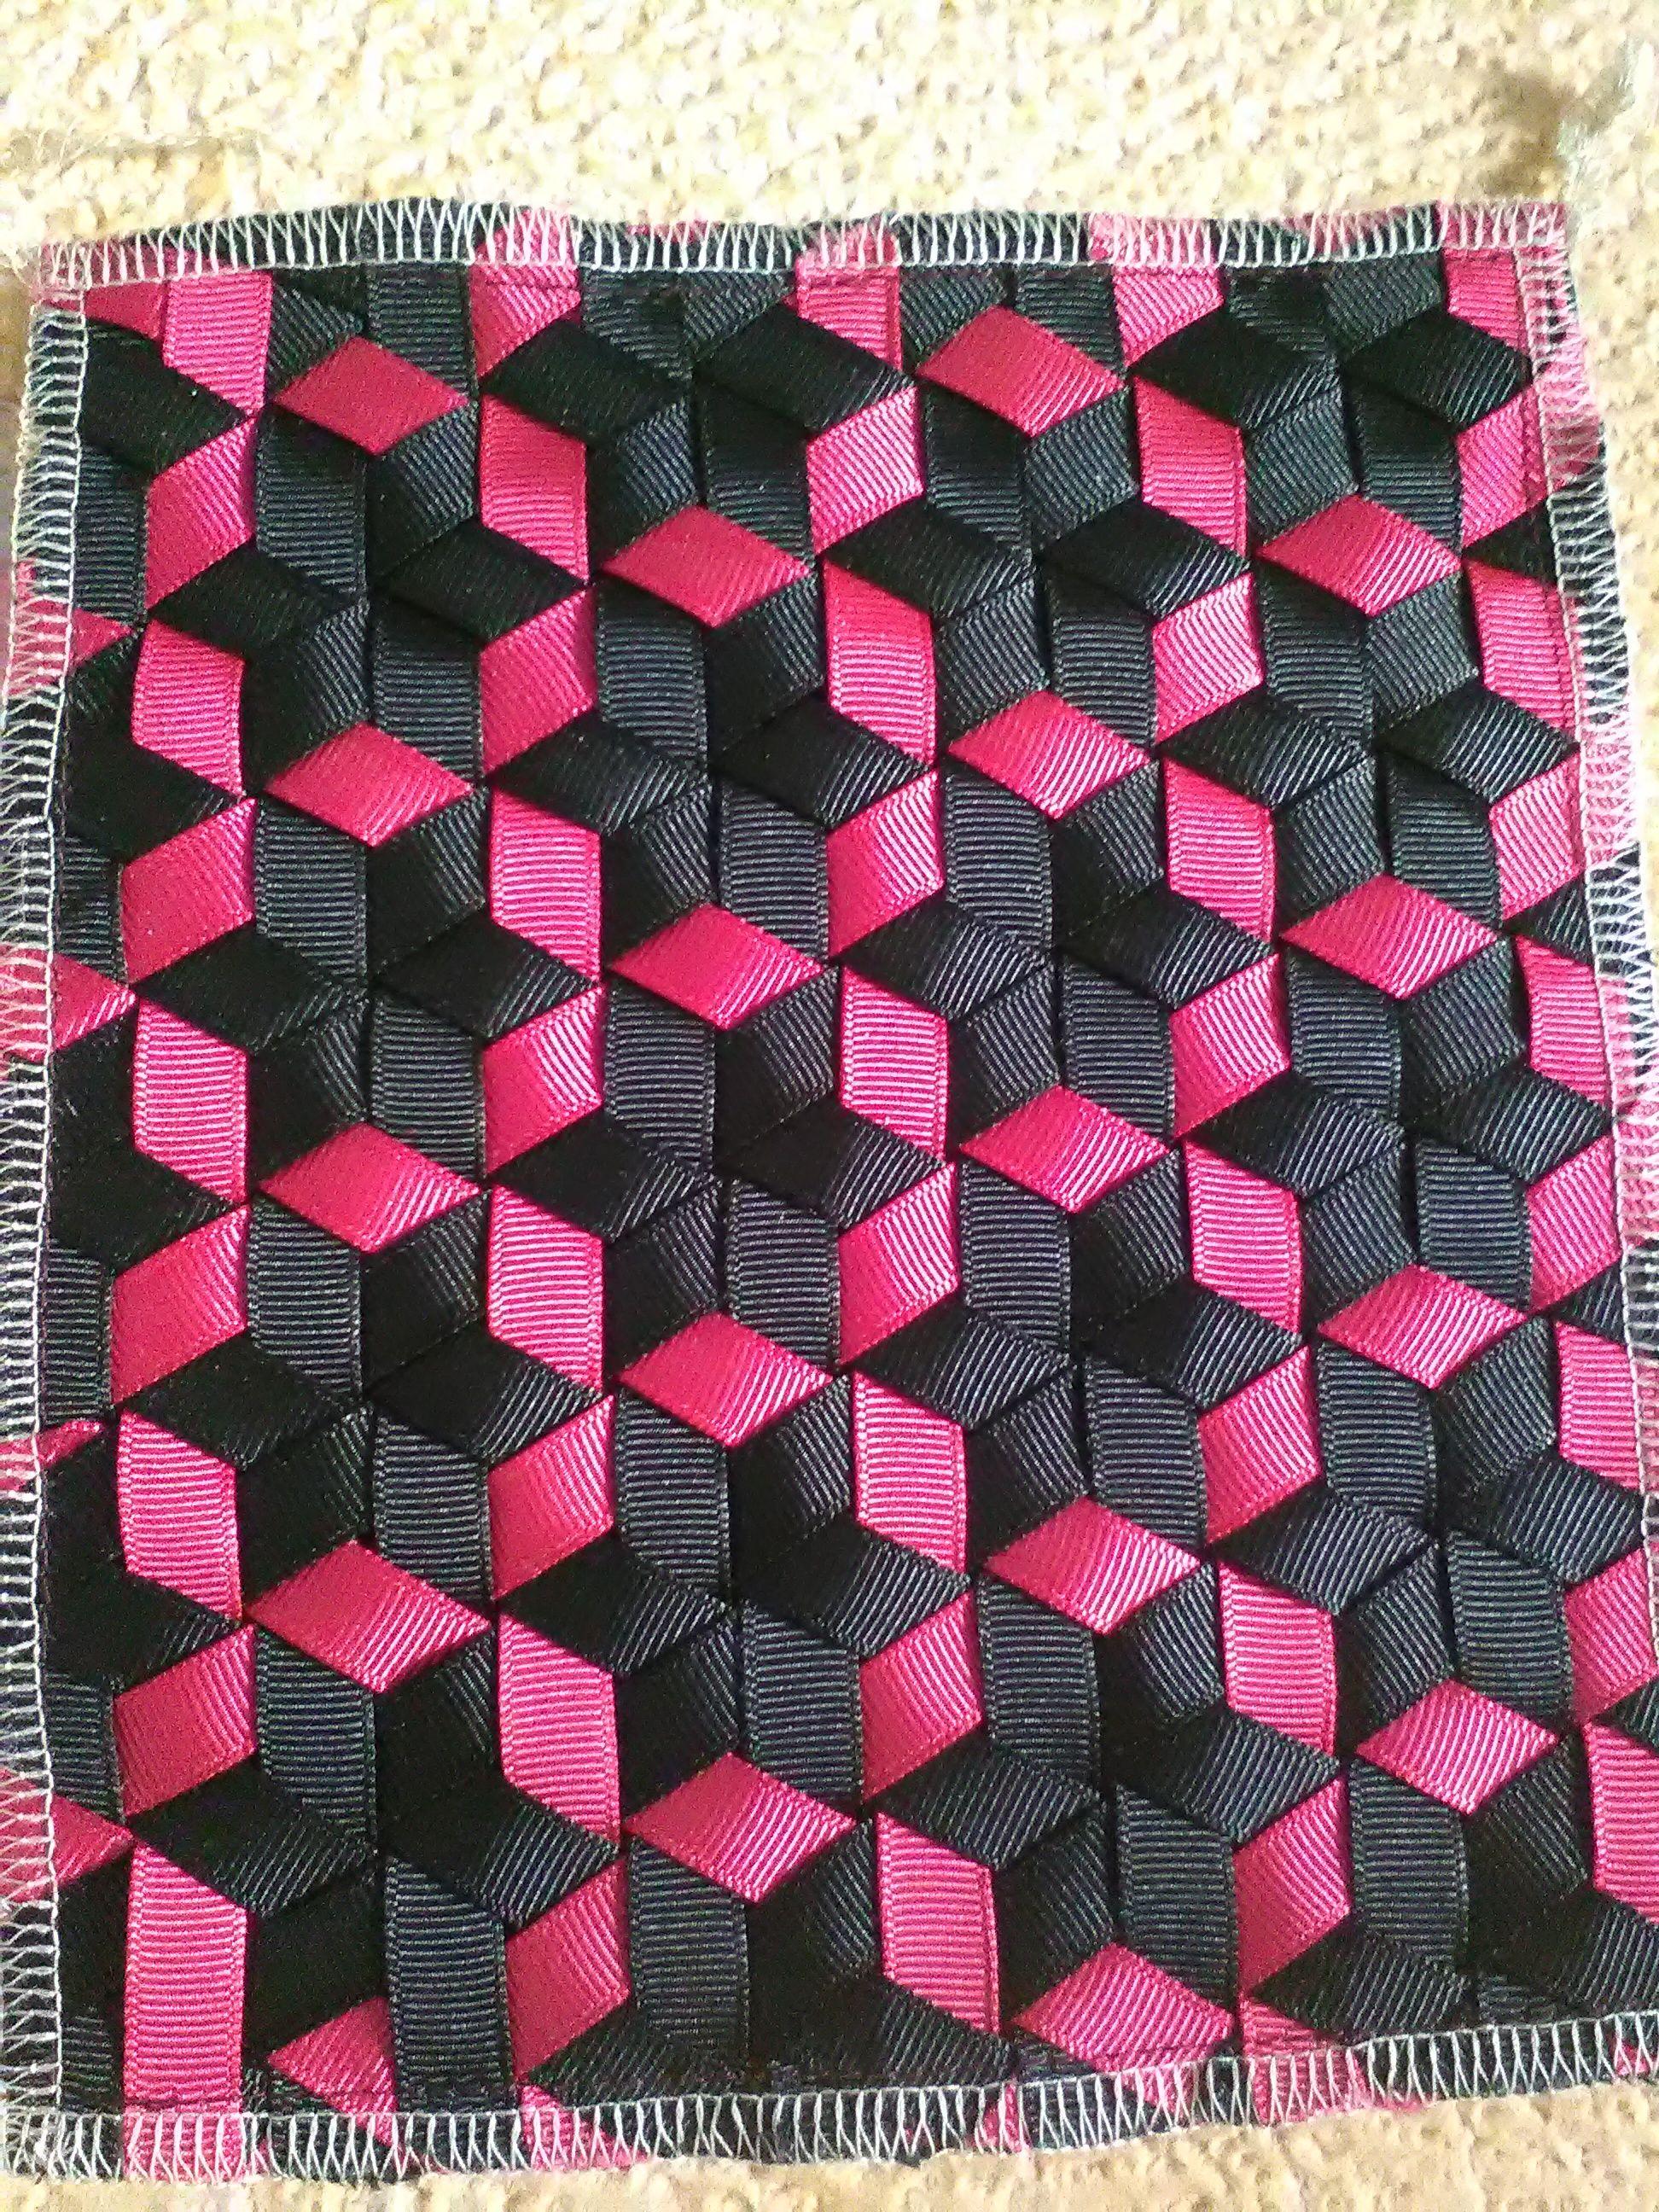 triaxial ribbon weaving | yes | Pinterest | Mutti, Streifen und Stoffe